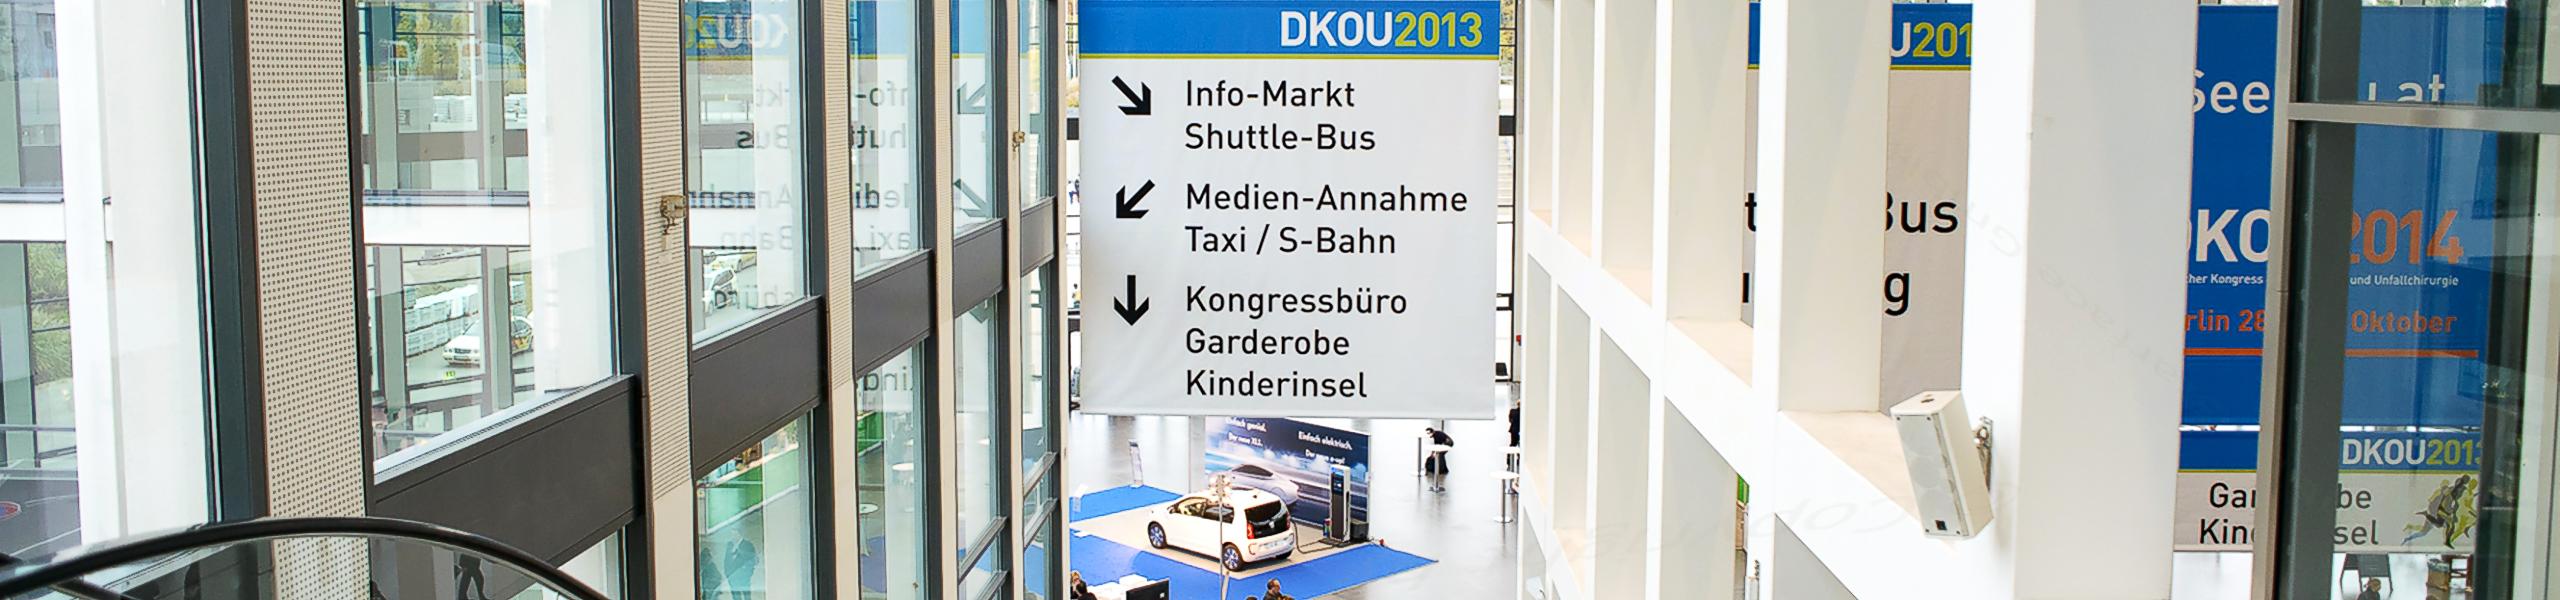 DKOU2019 Information